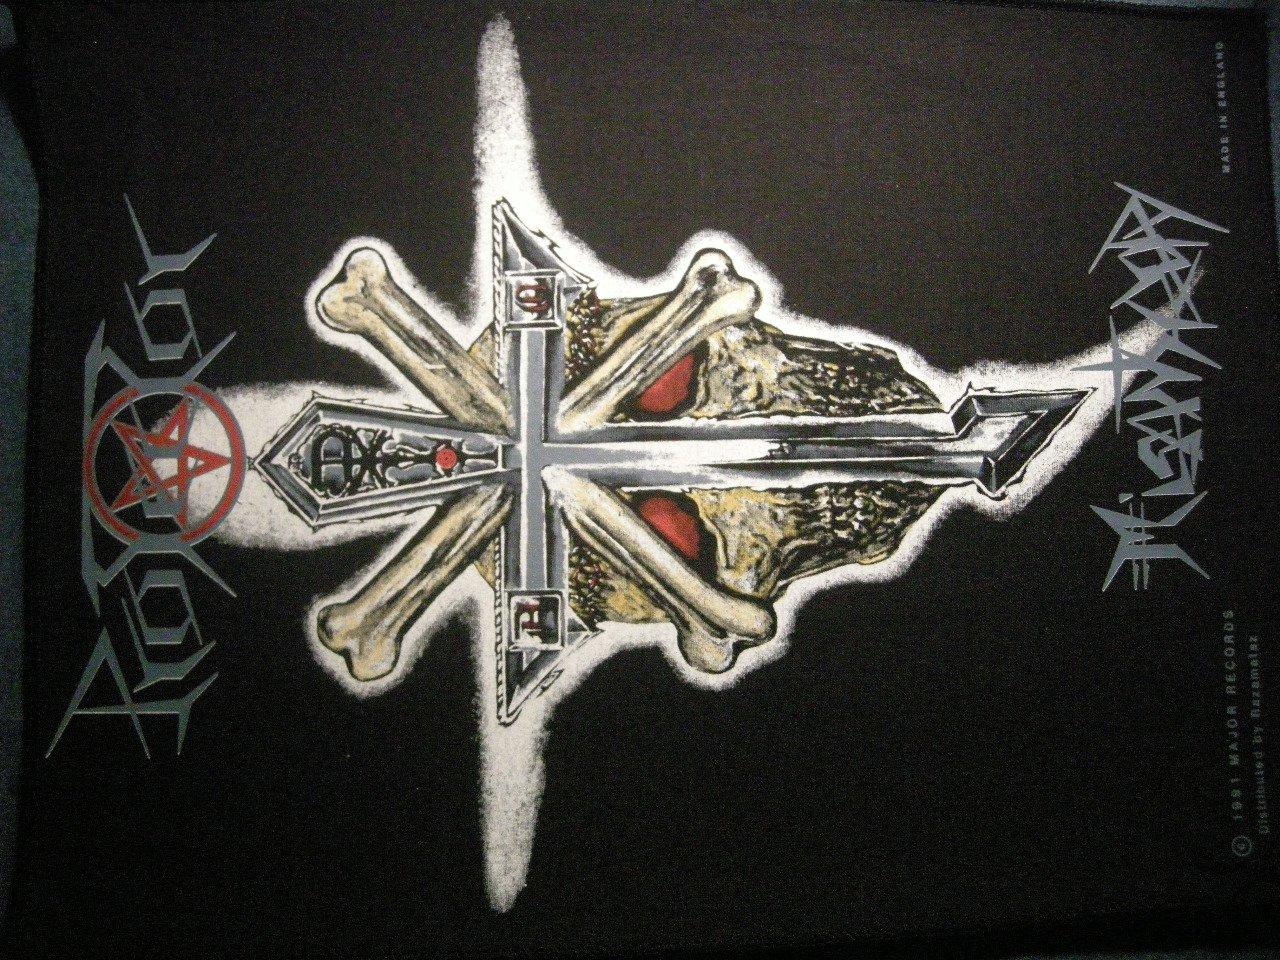 PROTECTOR BACKPATCH Misanthropy metal patch VINTAGE